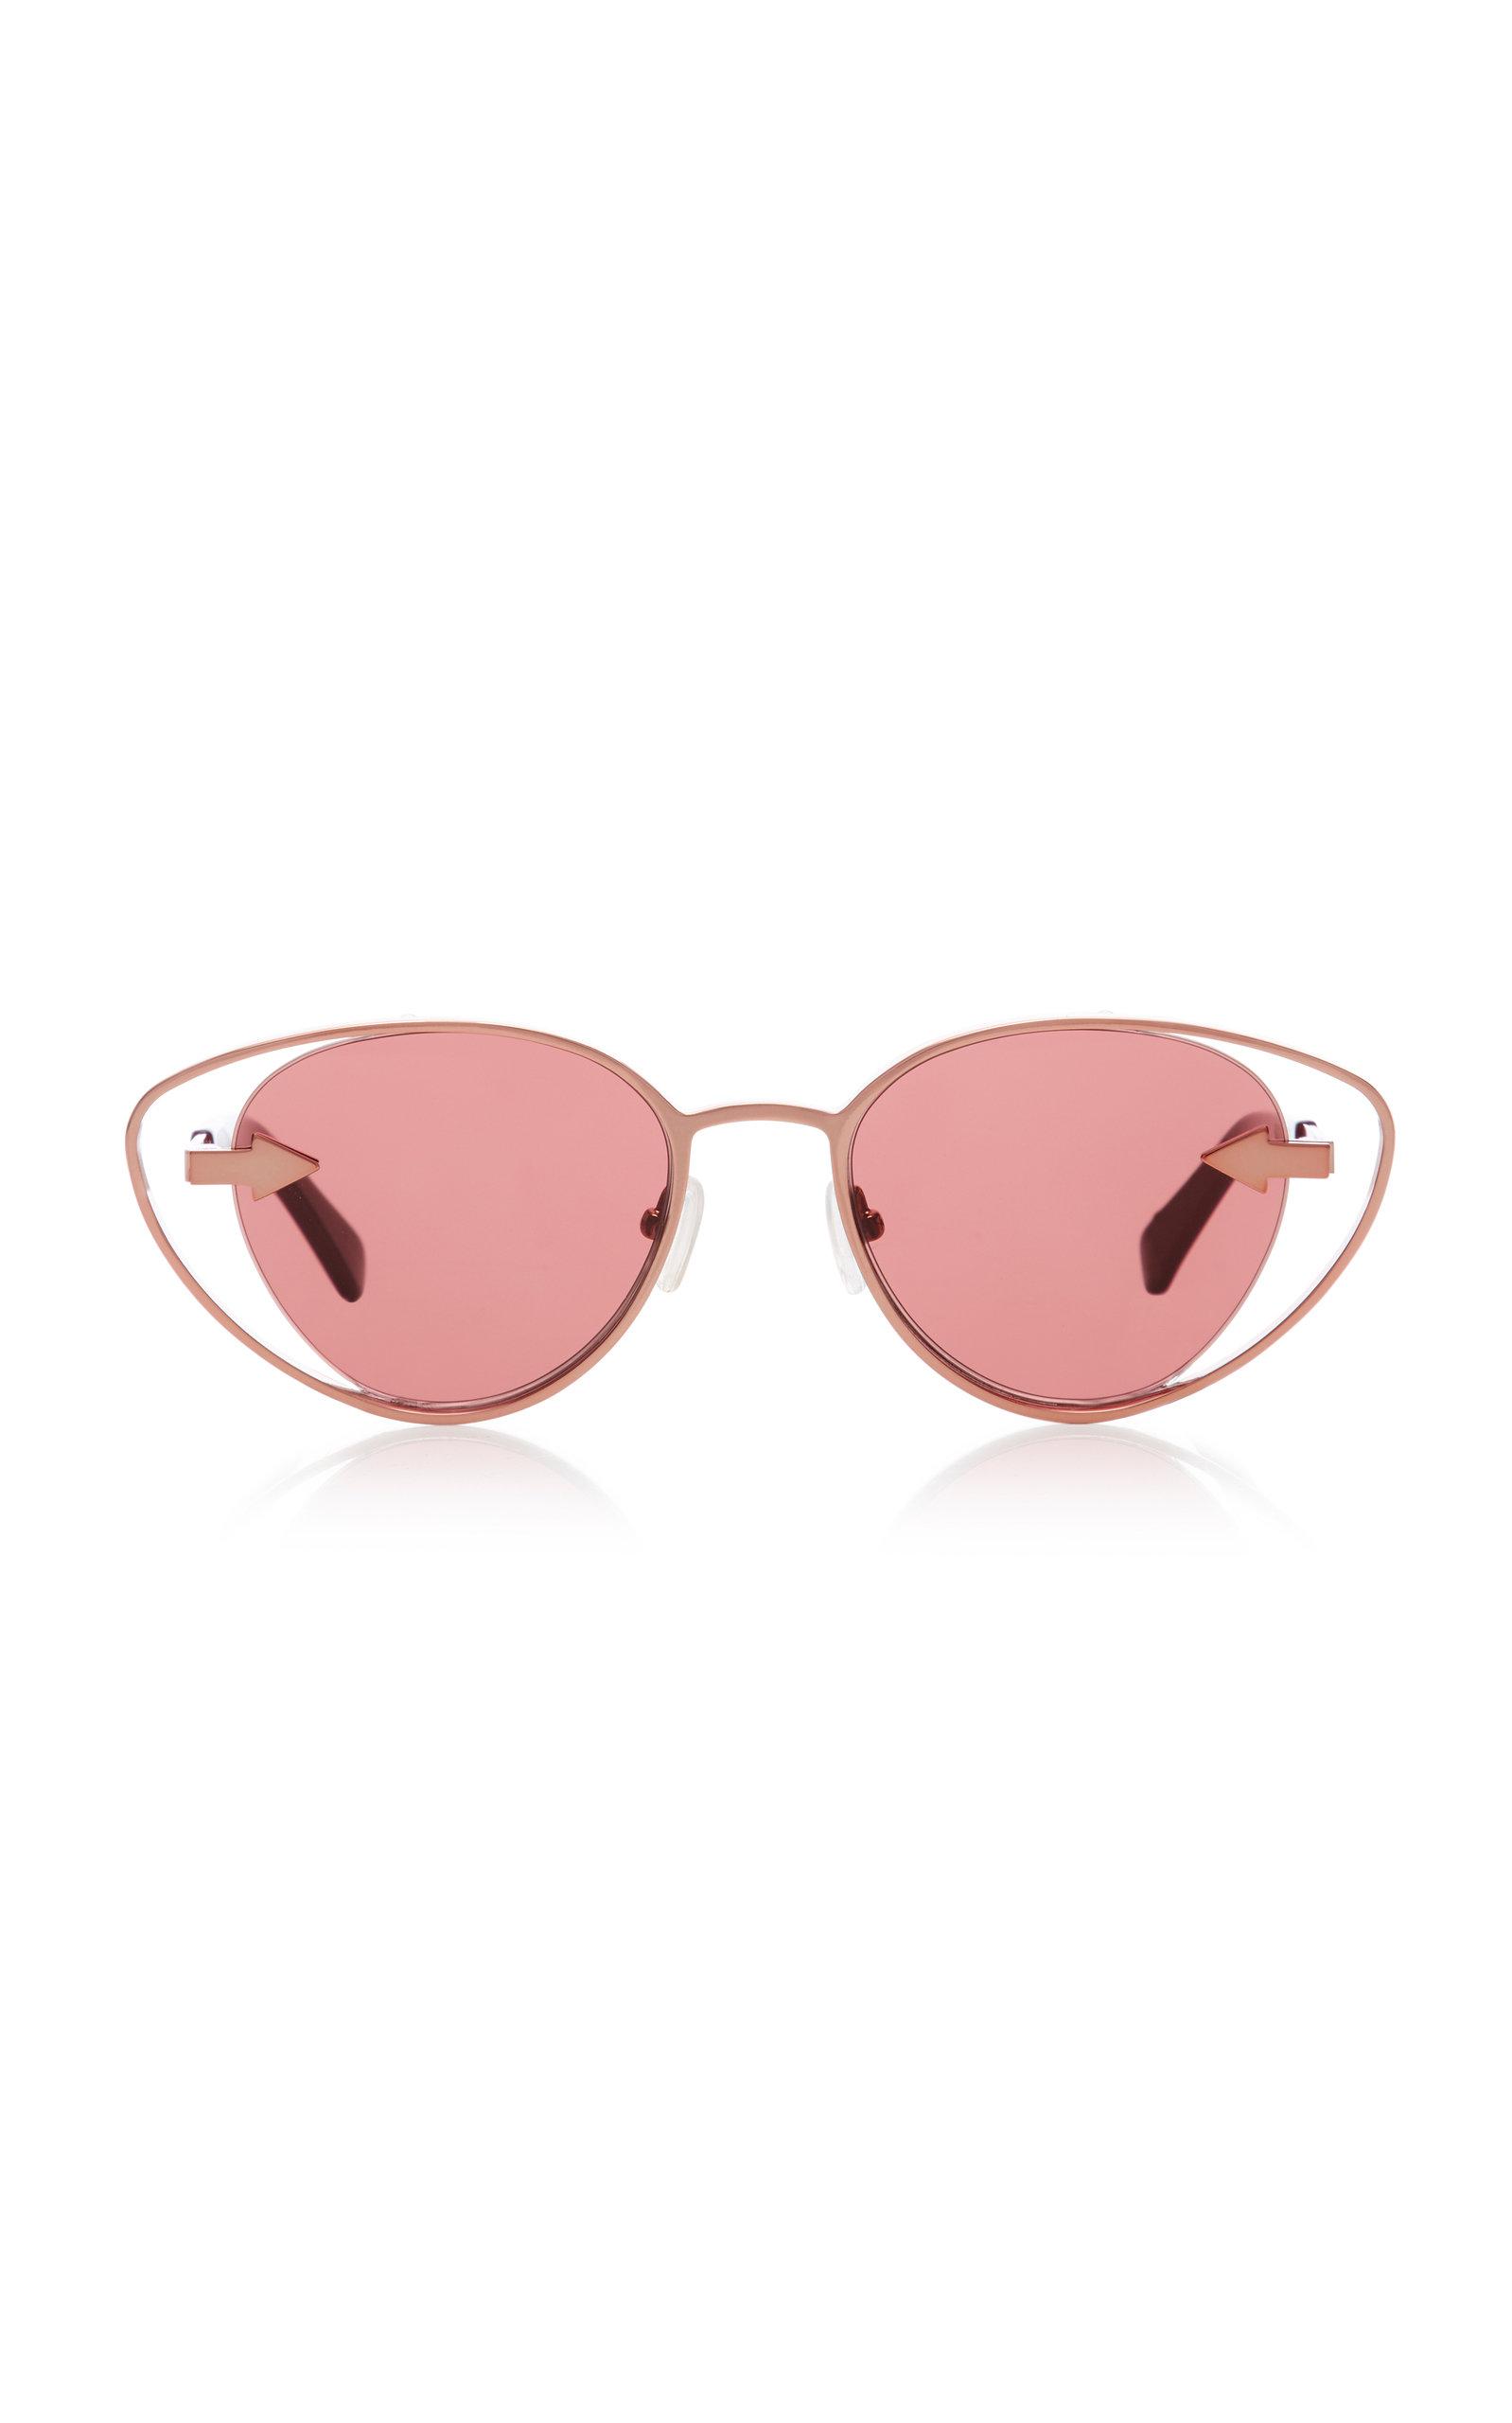 eeac7a0ba51 Karen WalkerKissy Kissy Cat-Eye Sunglasses. CLOSE. Loading